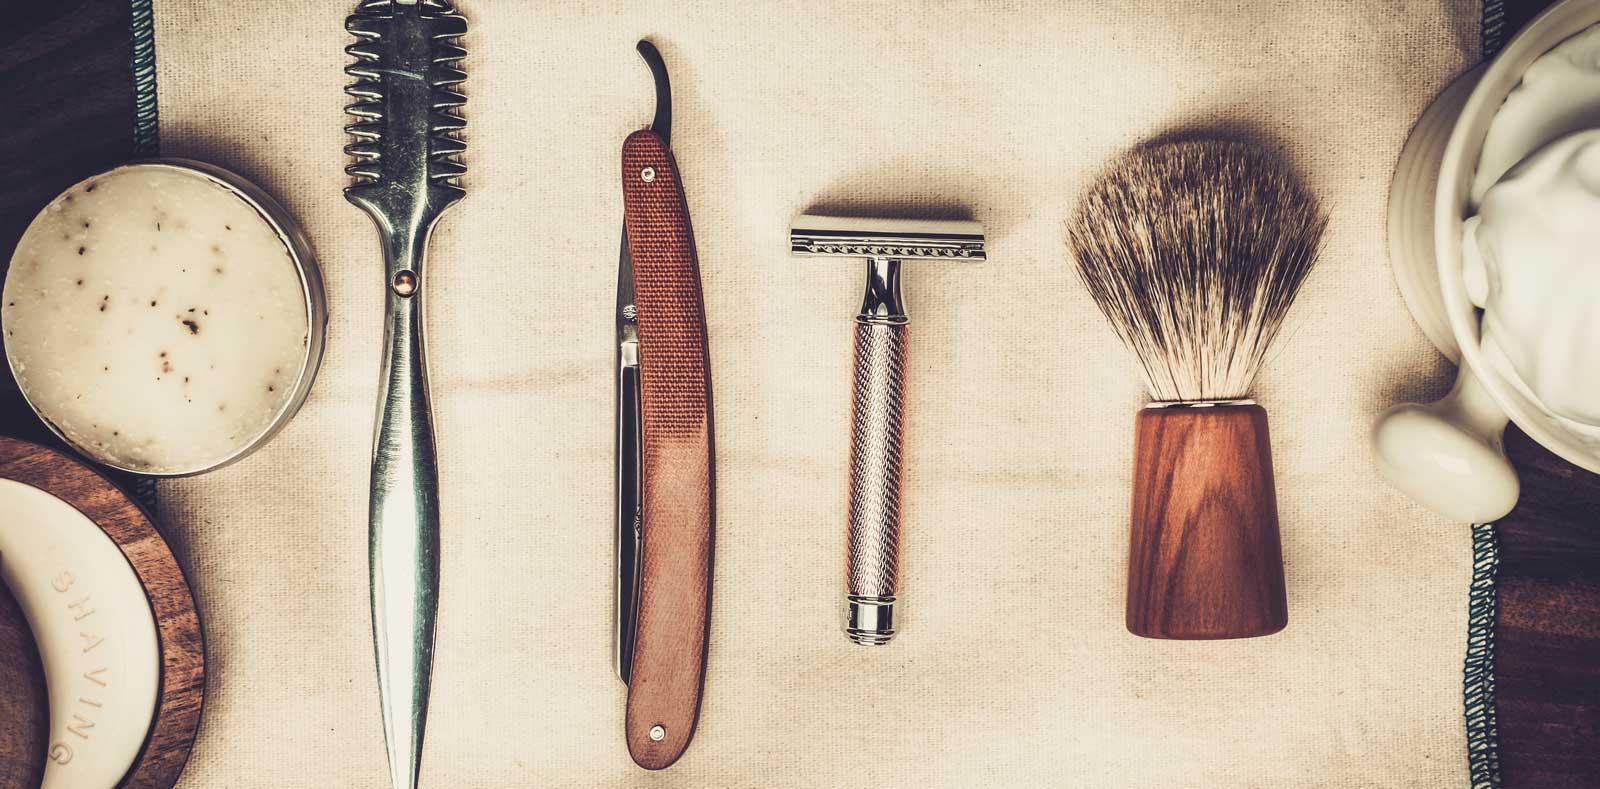 Razors and shaving tools in barbershop